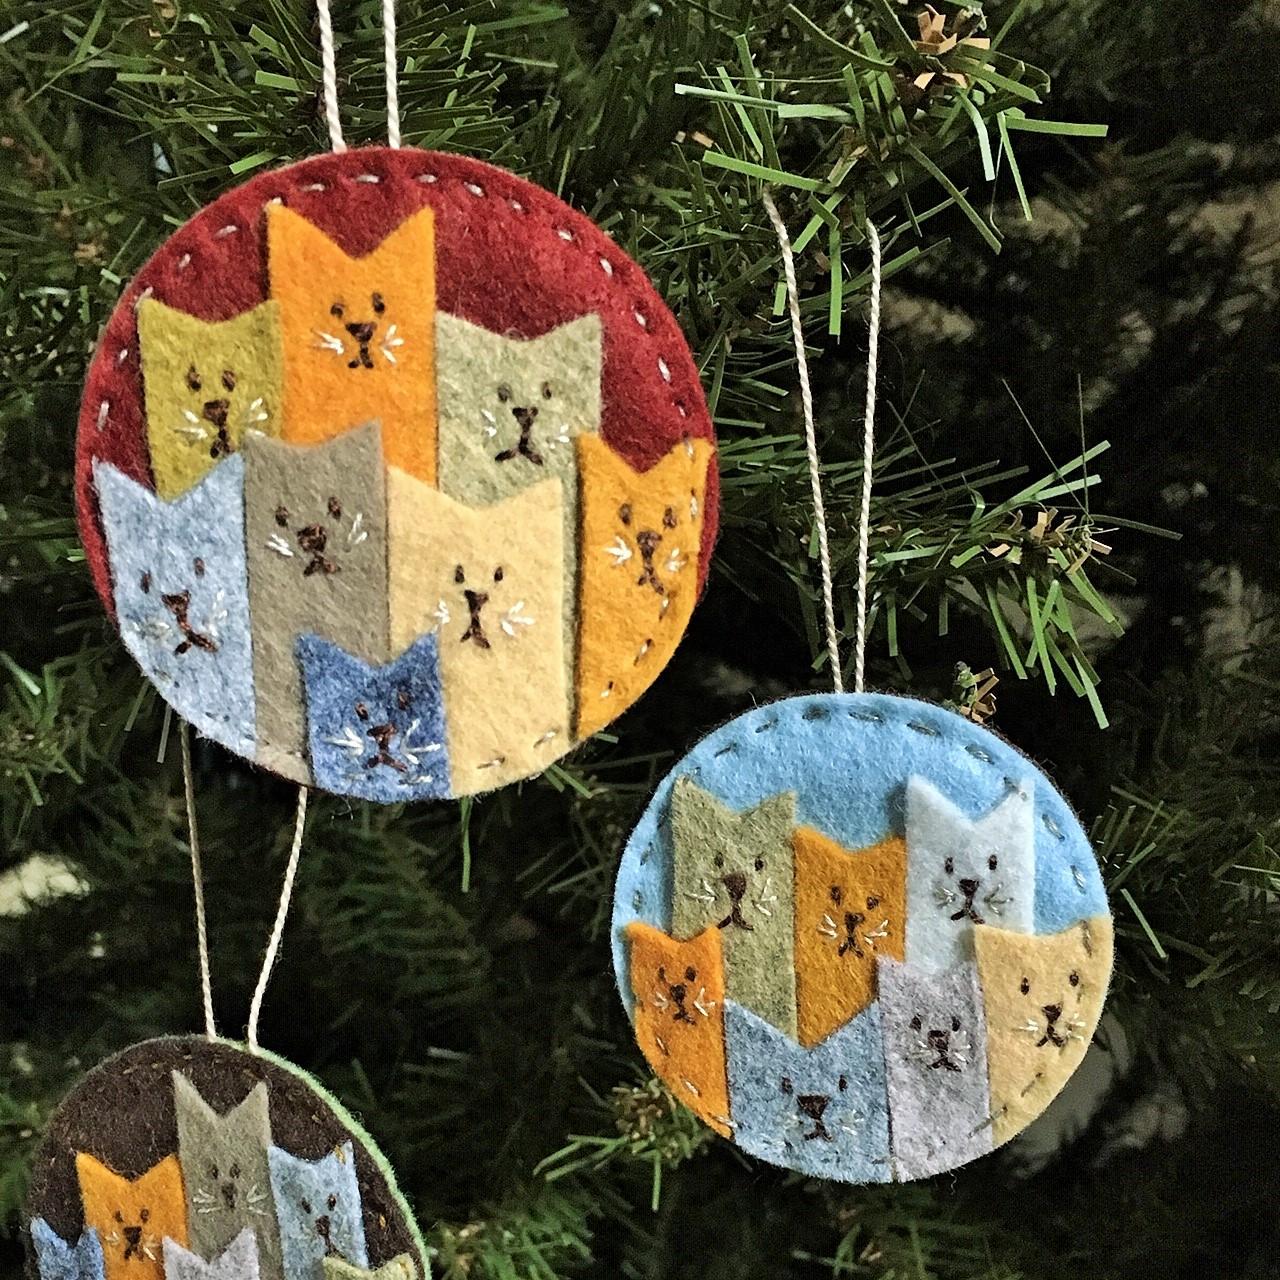 kitty ornaments.jpg